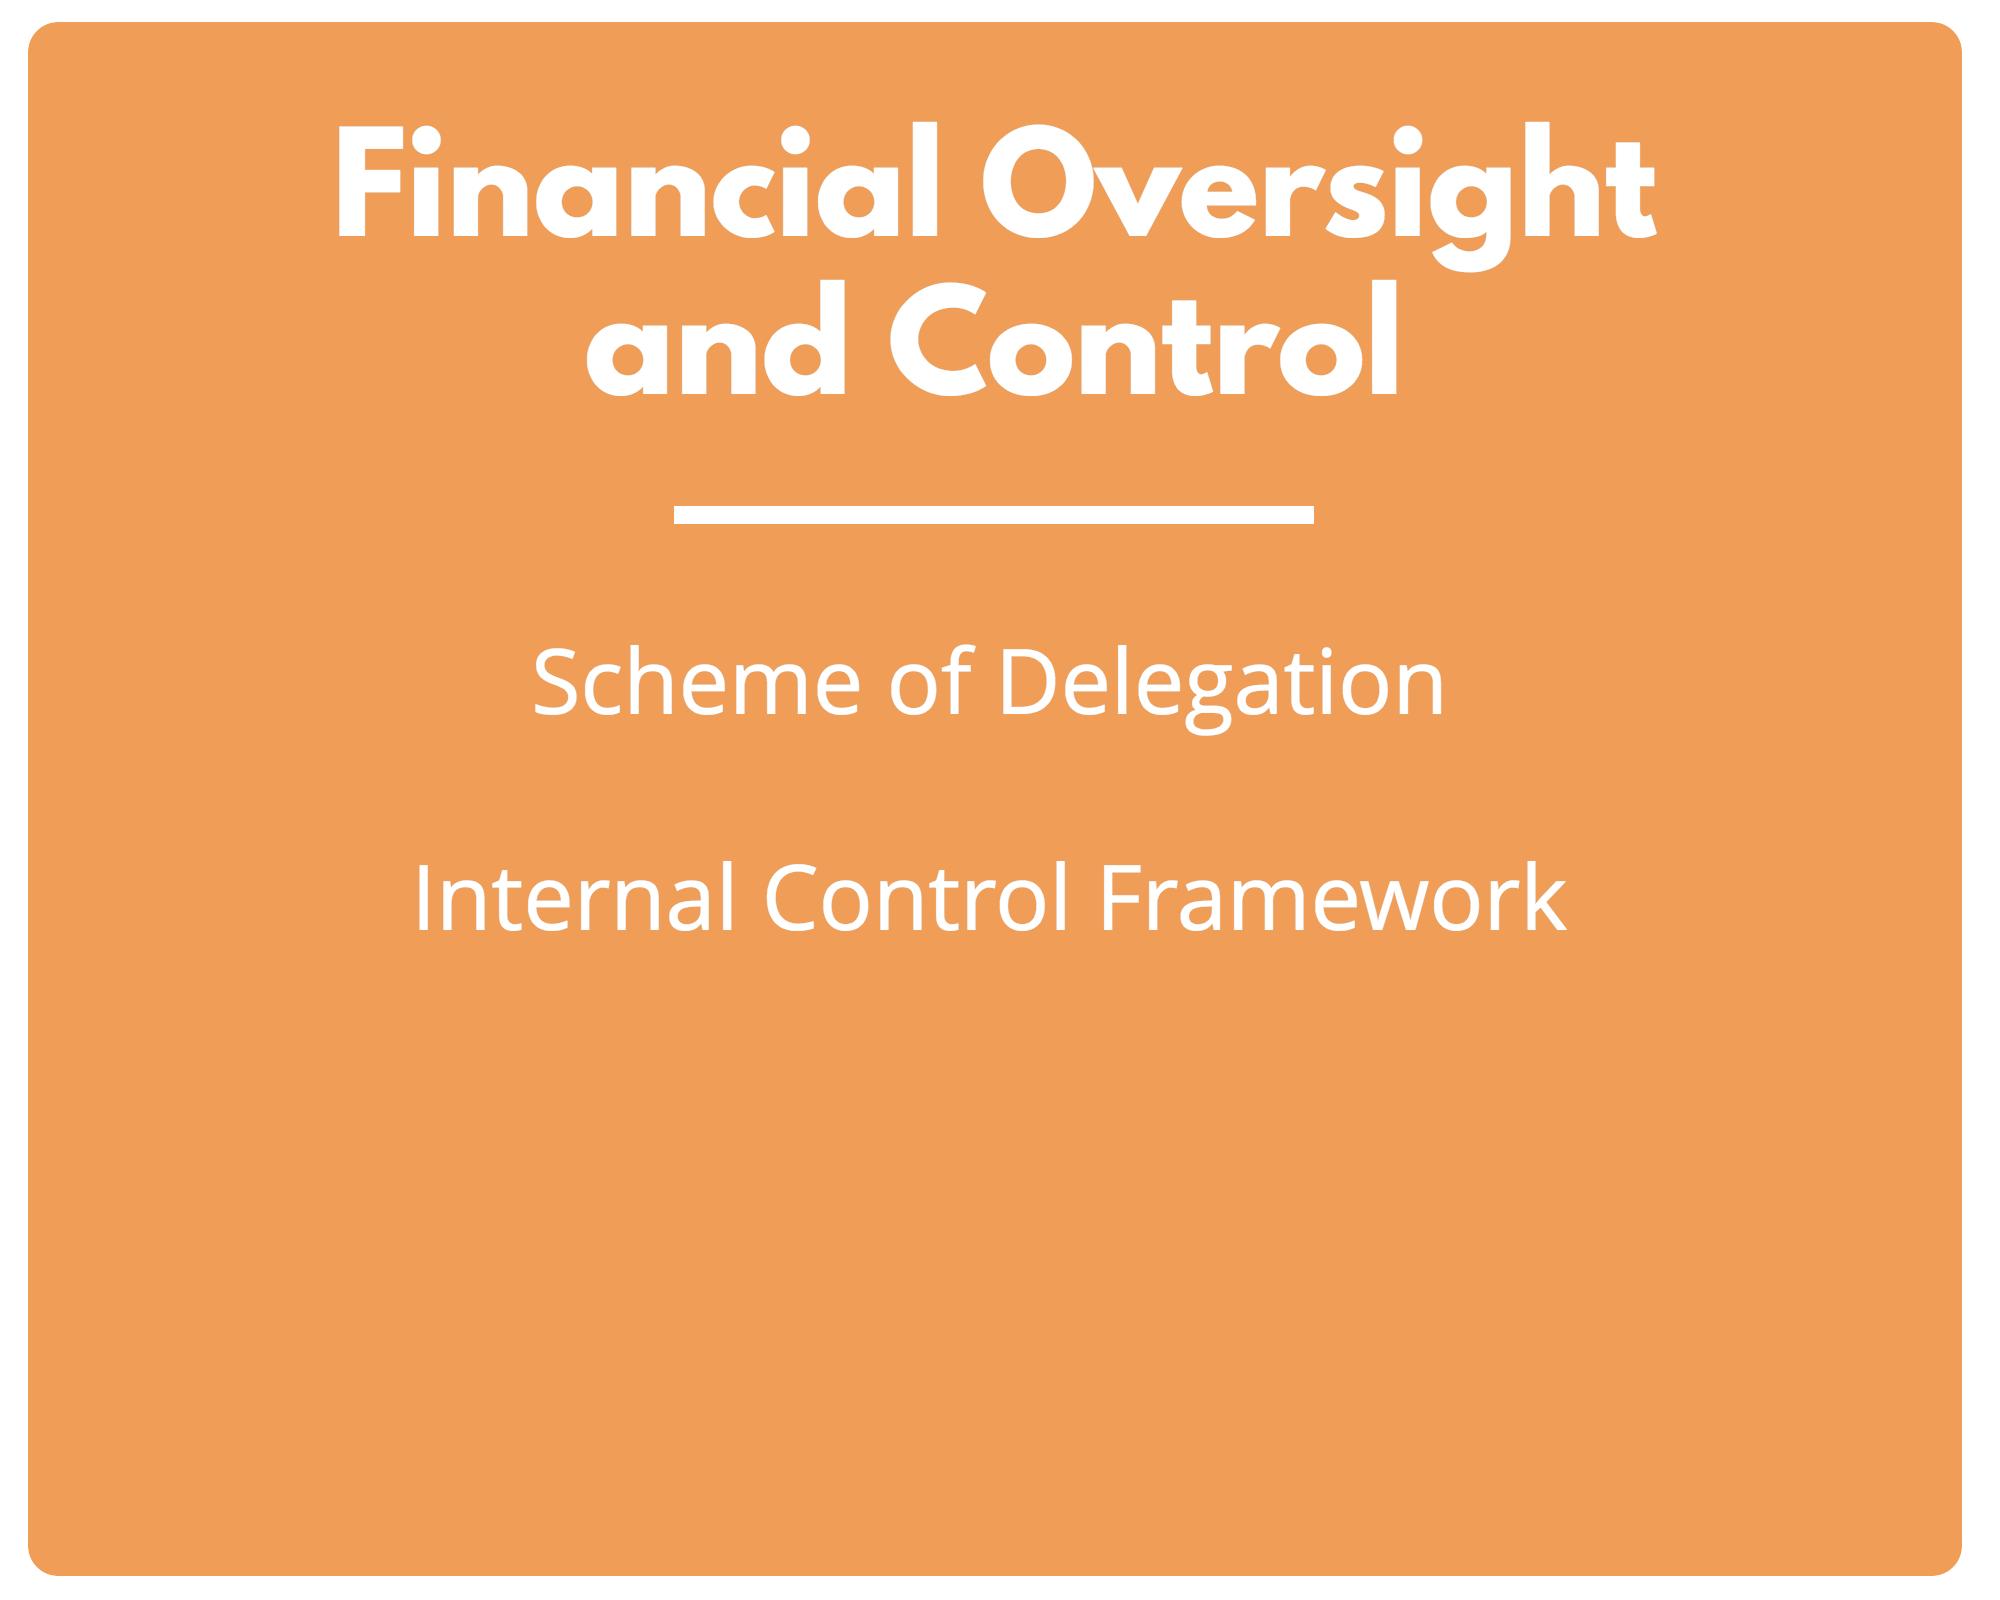 Financial Oversight